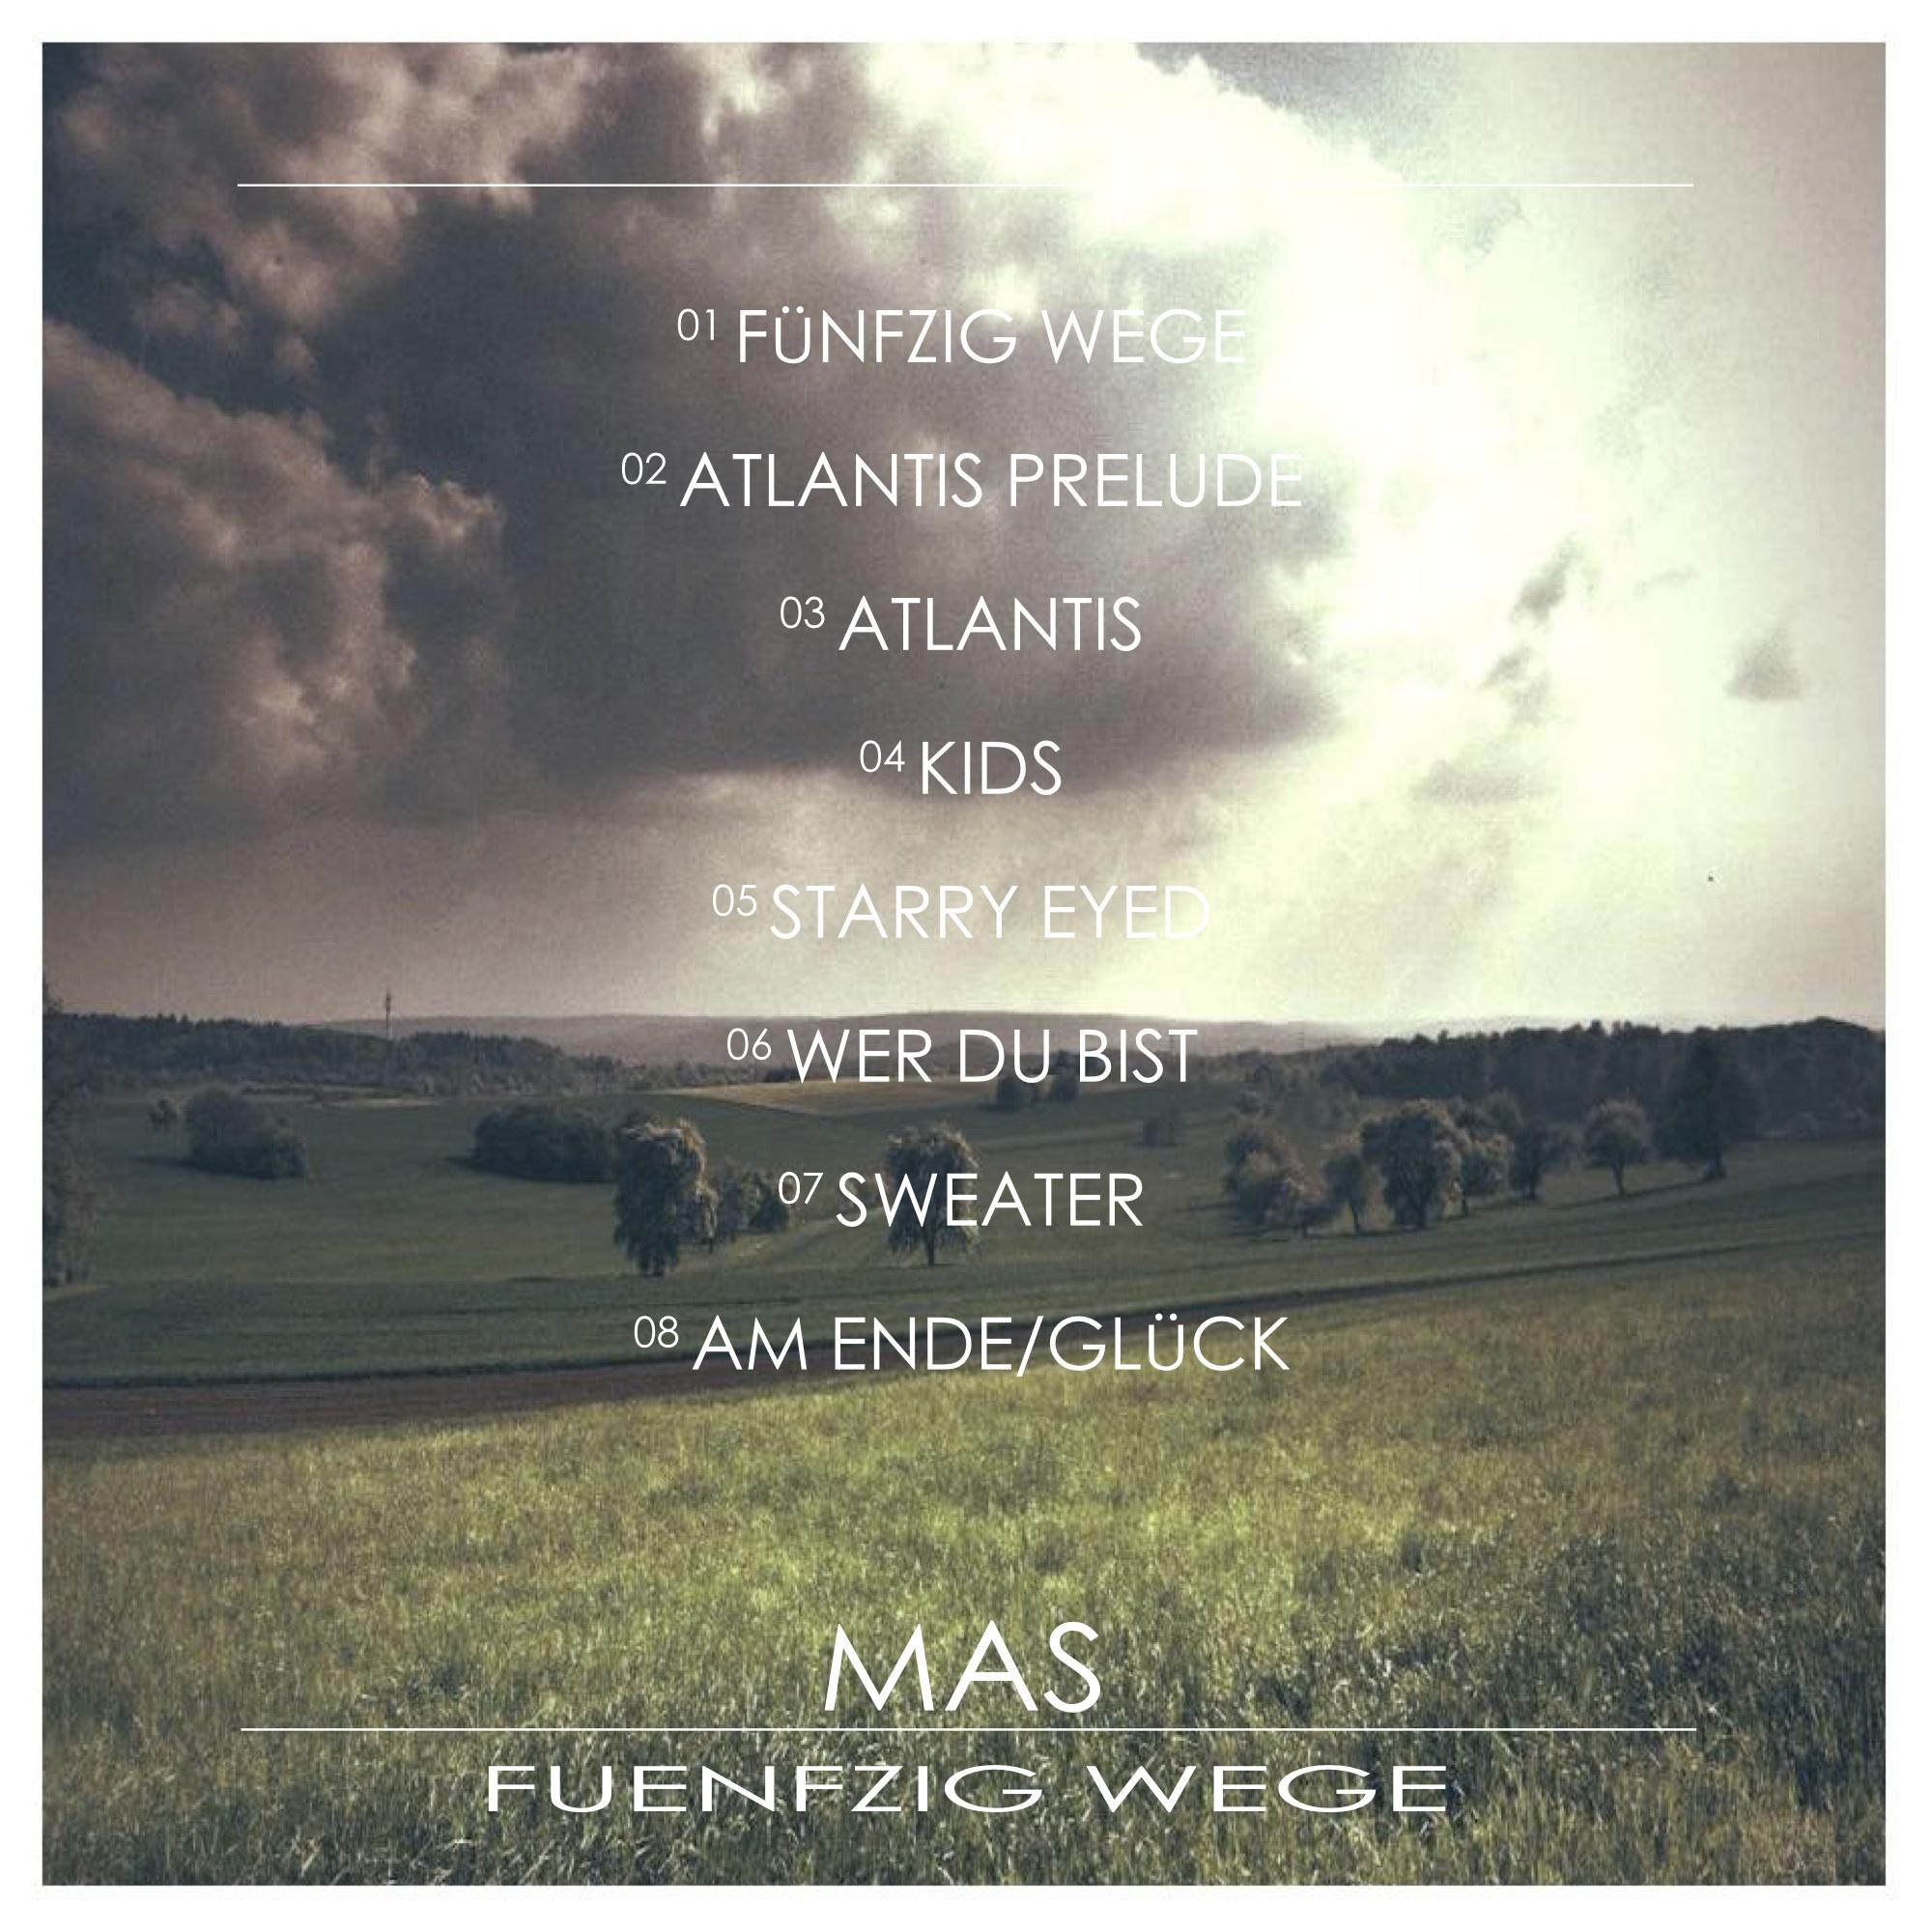 MAS - 50 Wege EP Cover Front